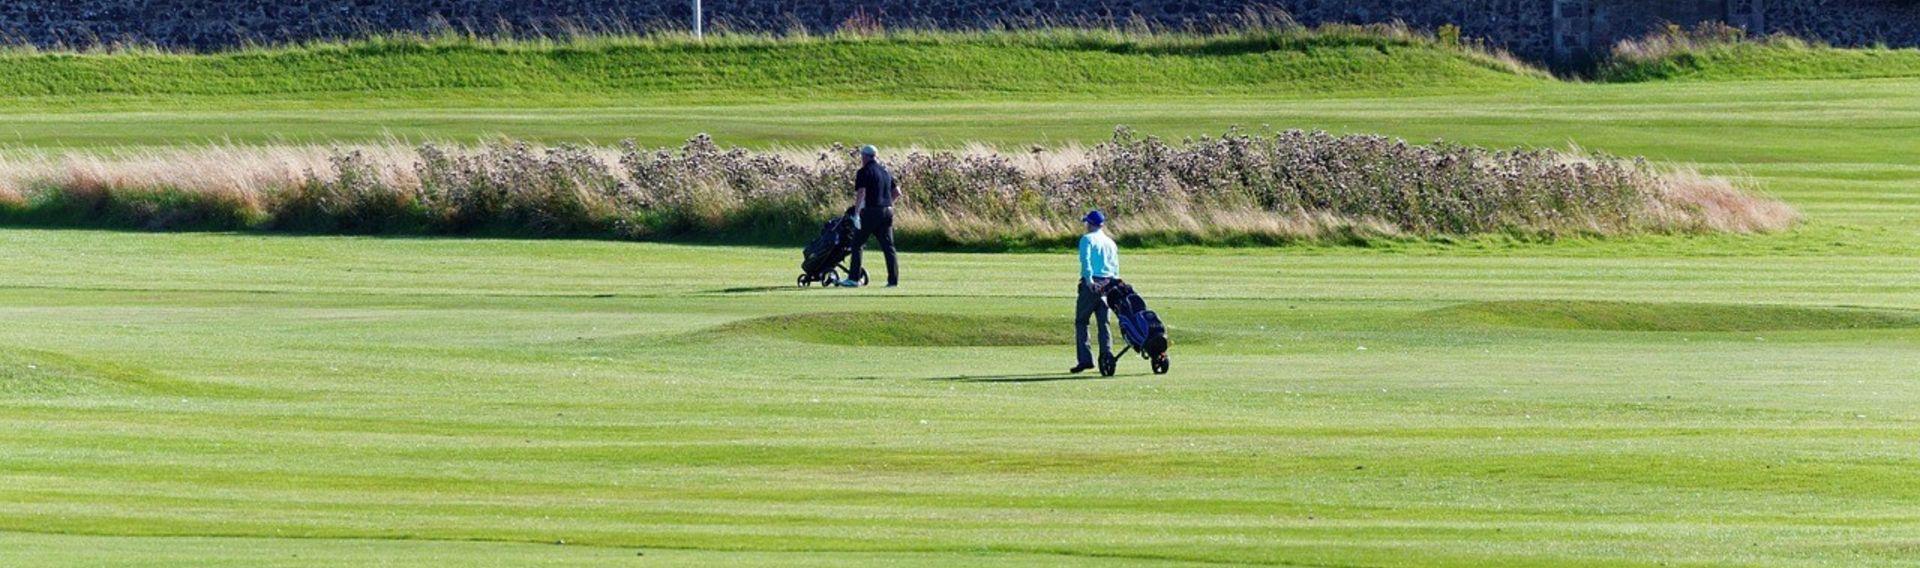 Golfclub Waldshagen